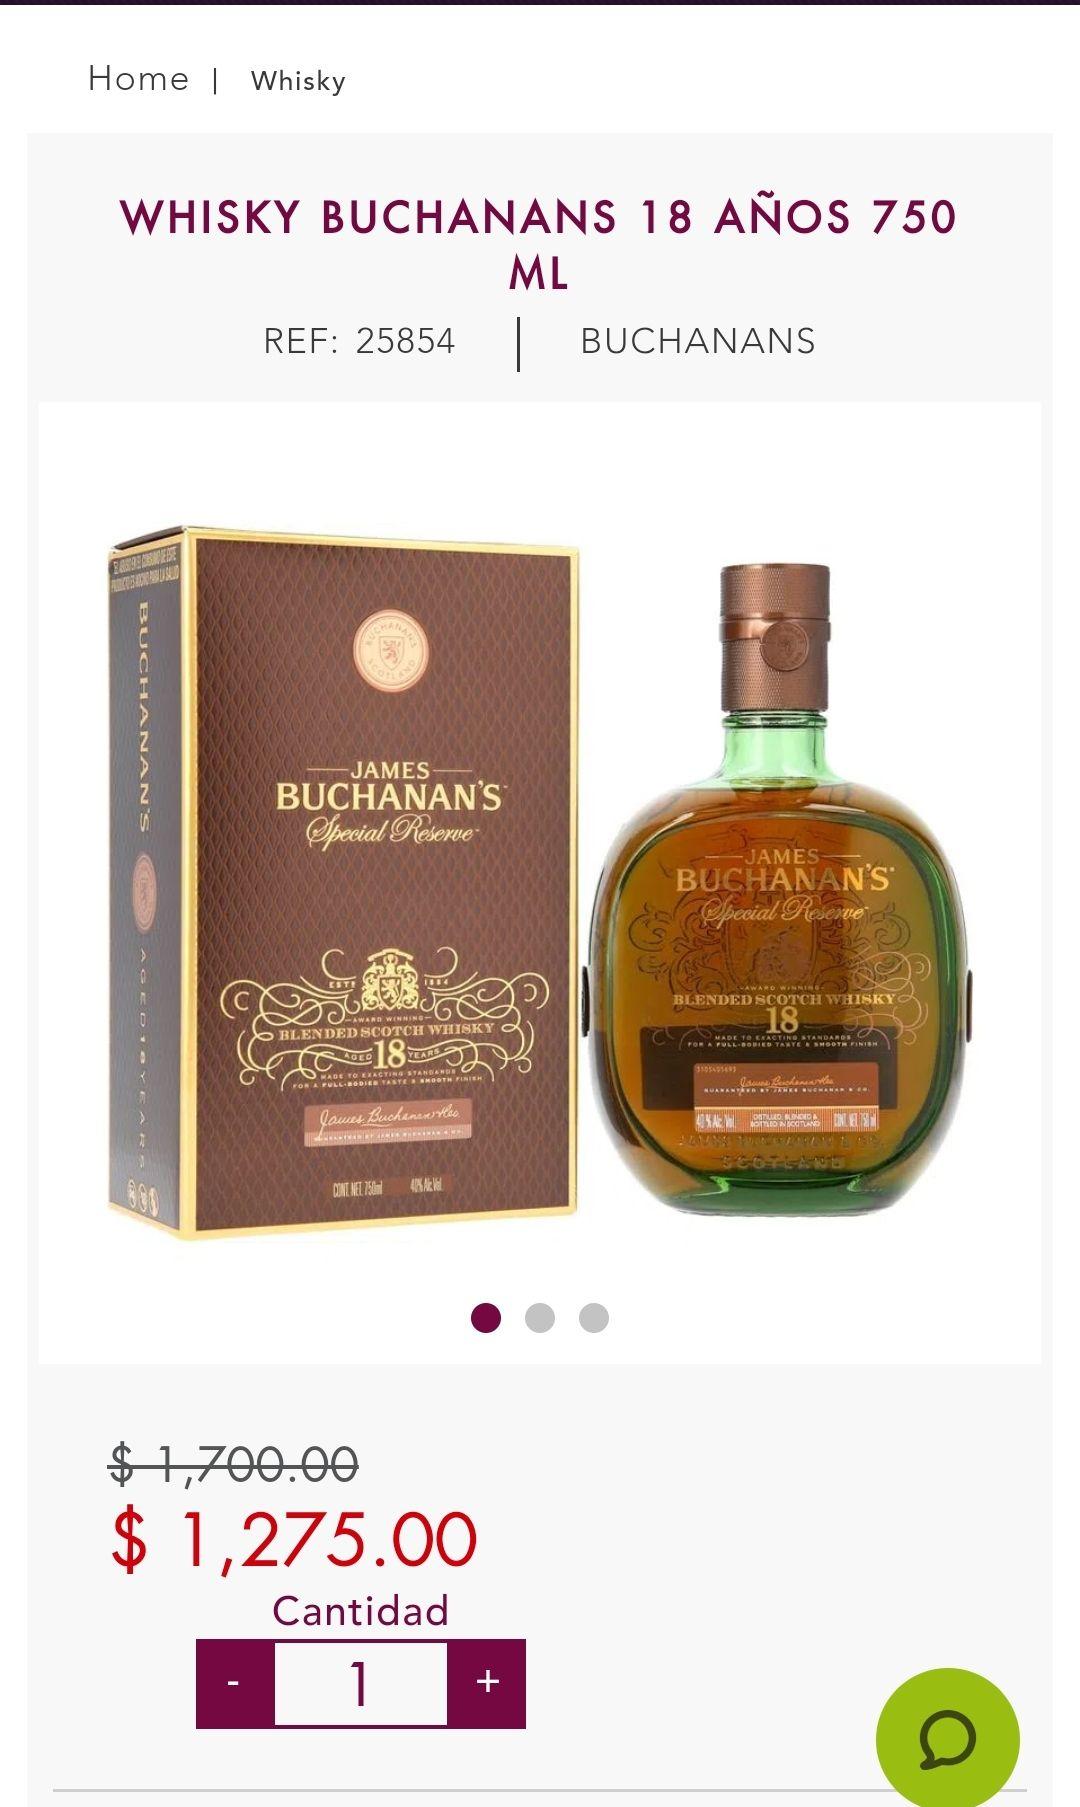 Bodegas Alianza: Whisky buchanans 18 años 750ml